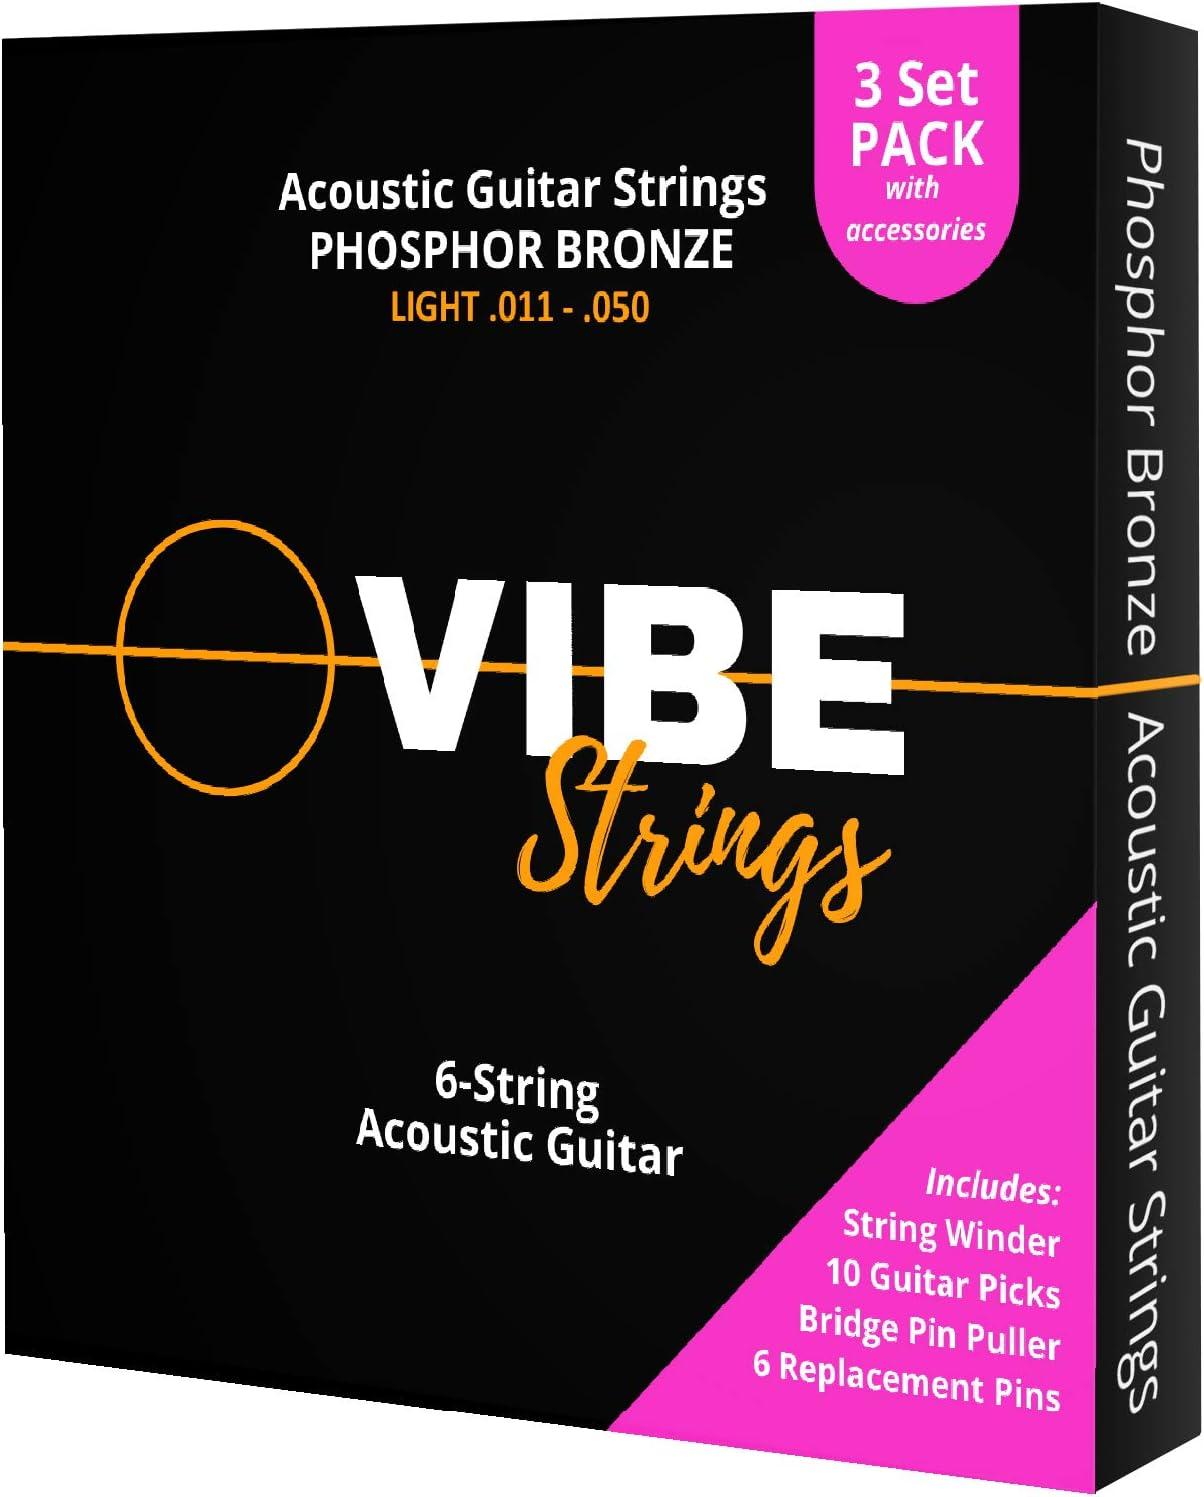 Vibe Strings Cuerdas Guitarra Acústica de Fósforo Bronce, 011-050, 3-Paquete con Herramientas